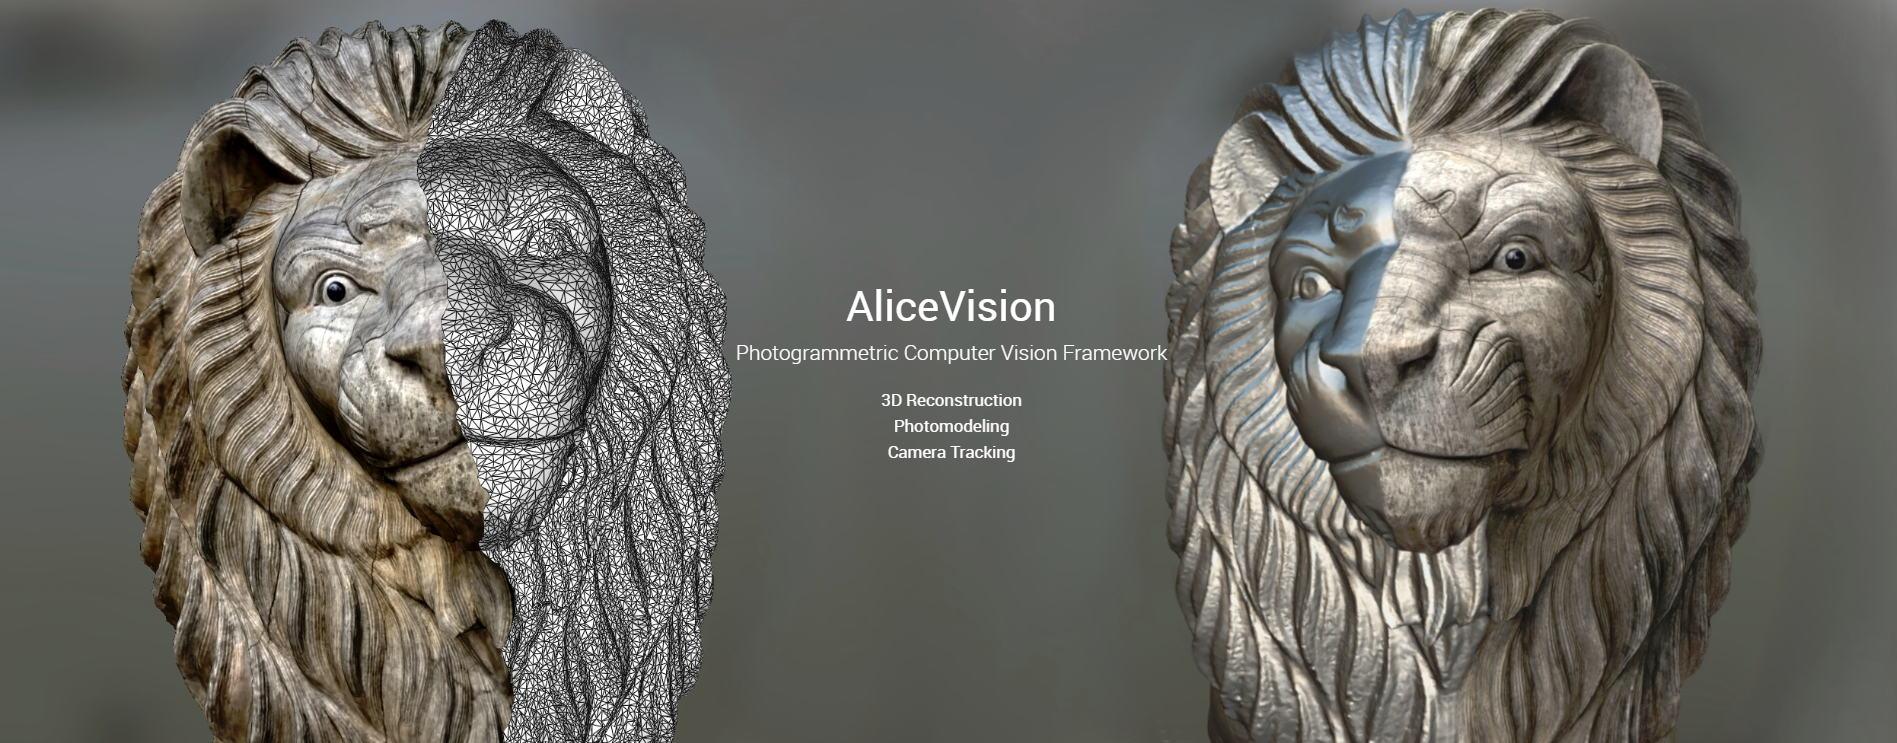 Alicevision